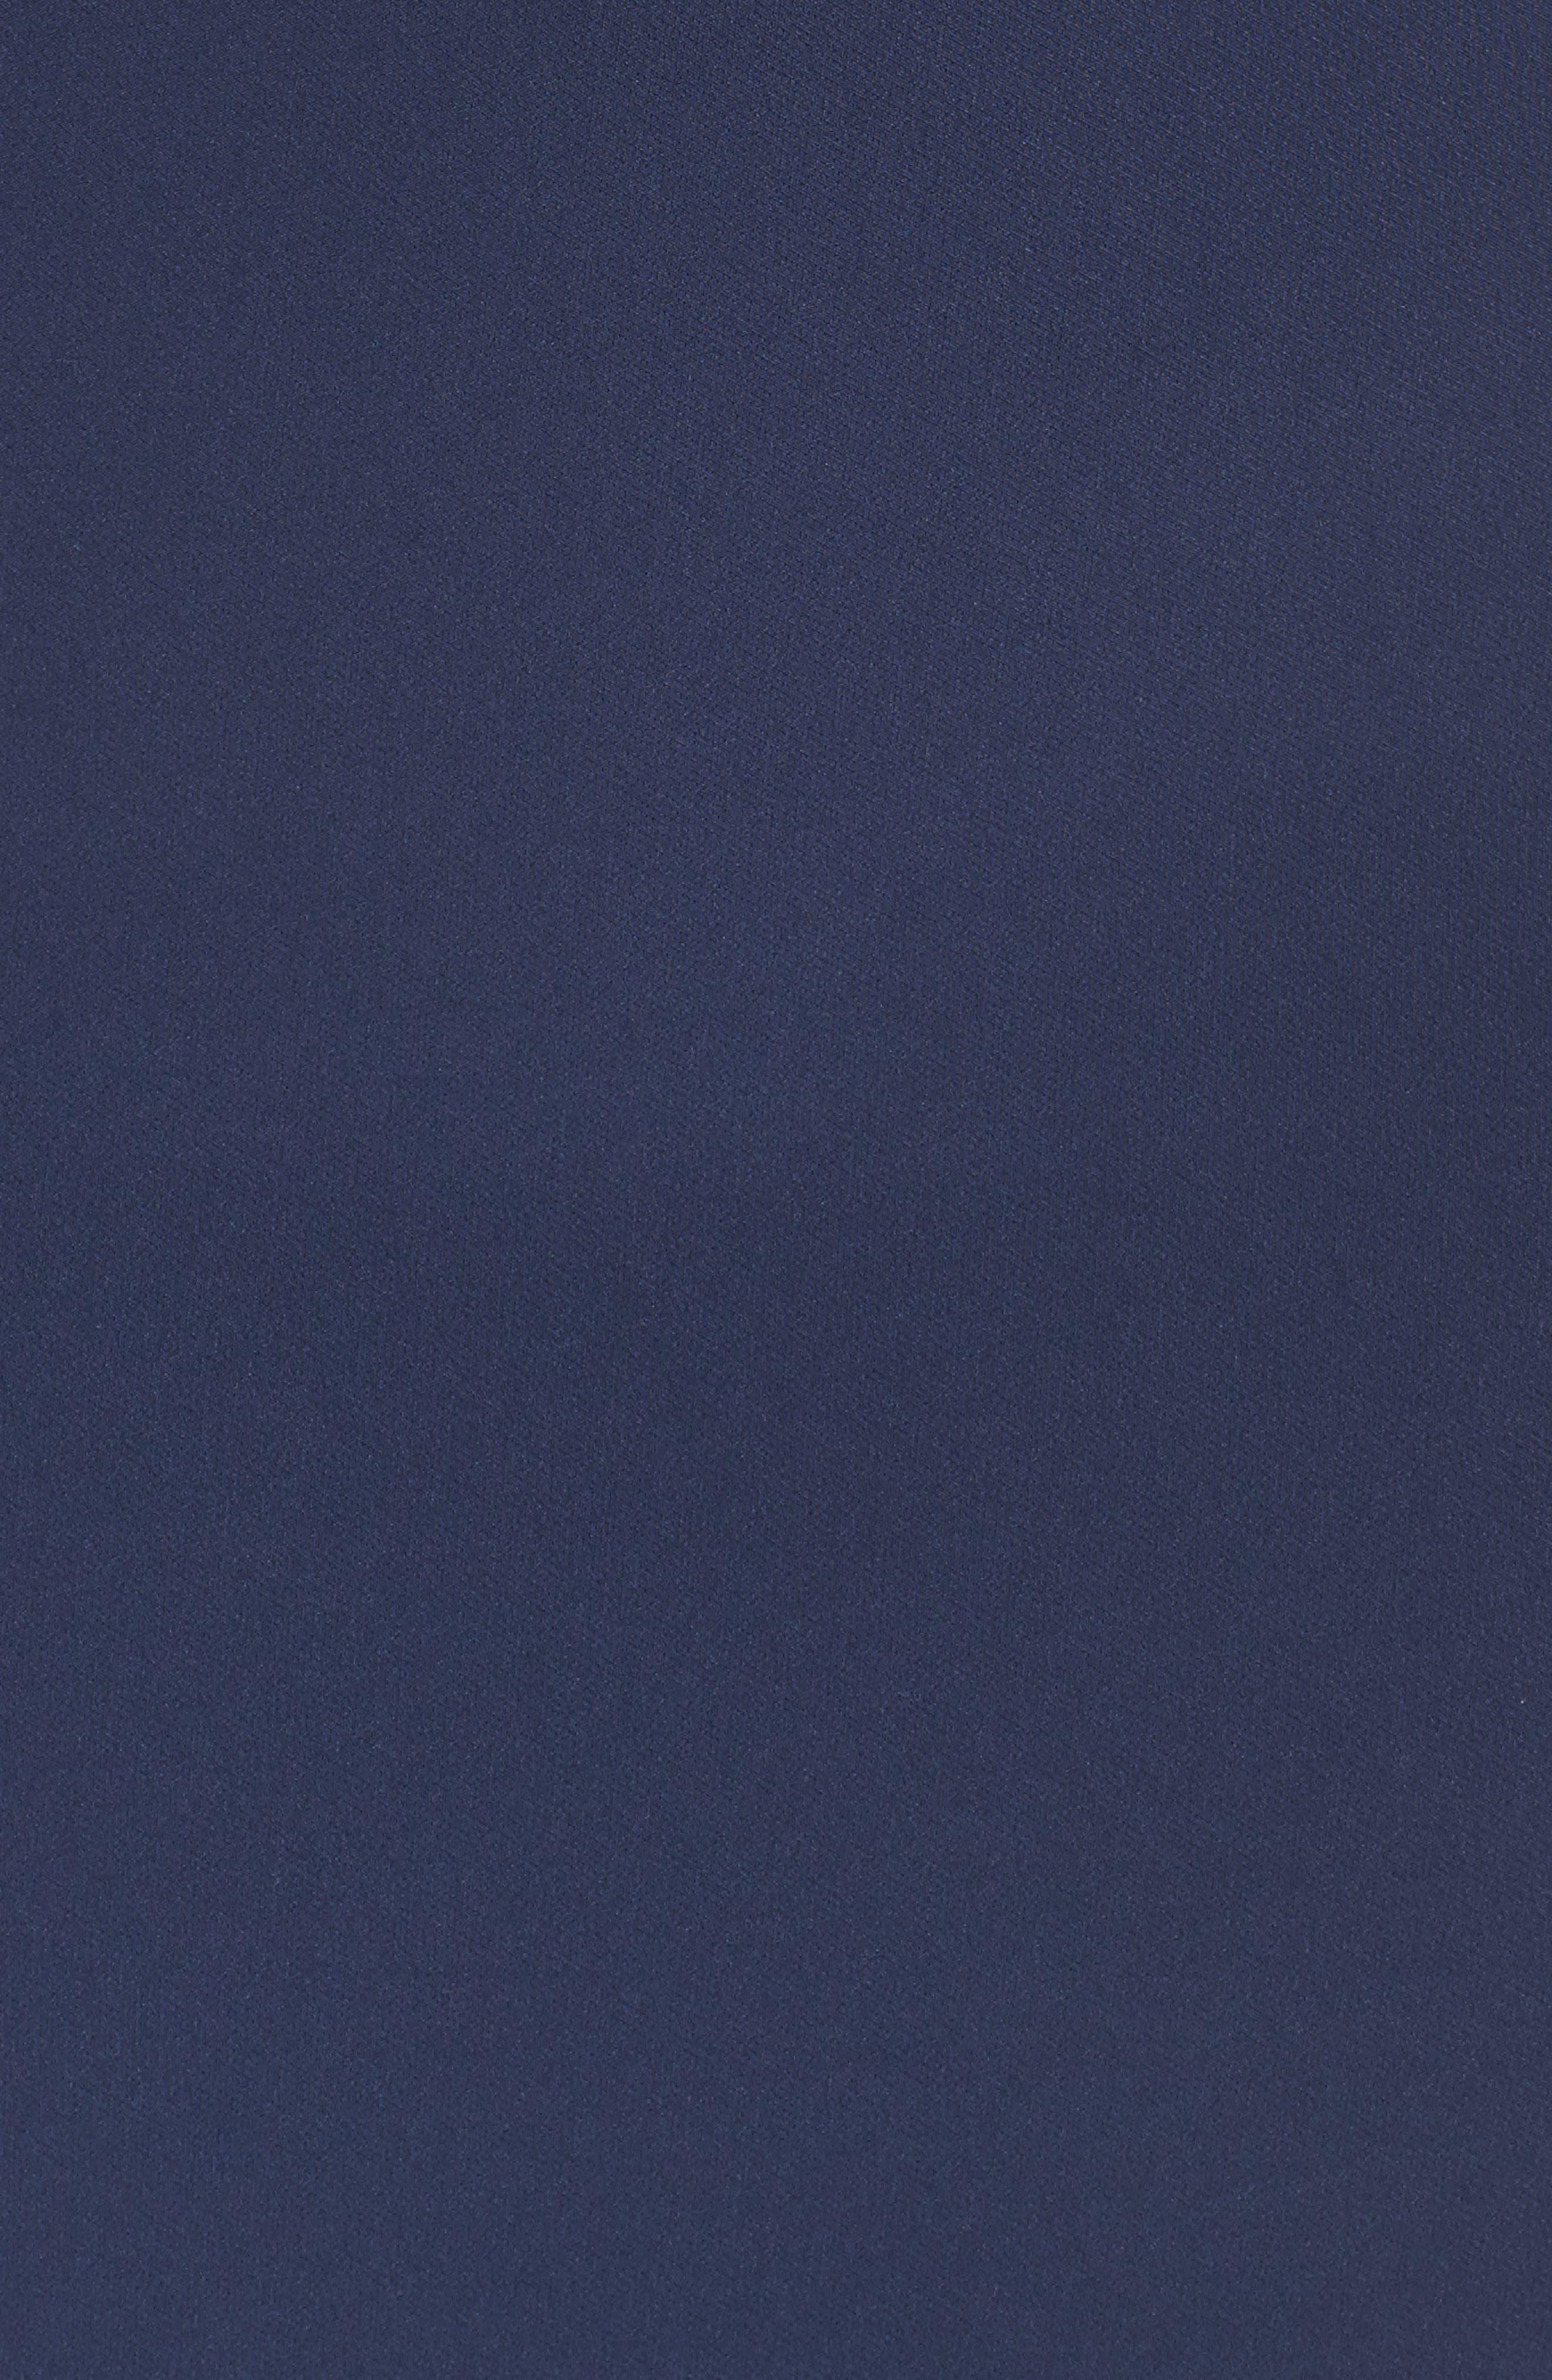 Strapless Ruffle Dress,                             Alternate thumbnail 5, color,                             Navy